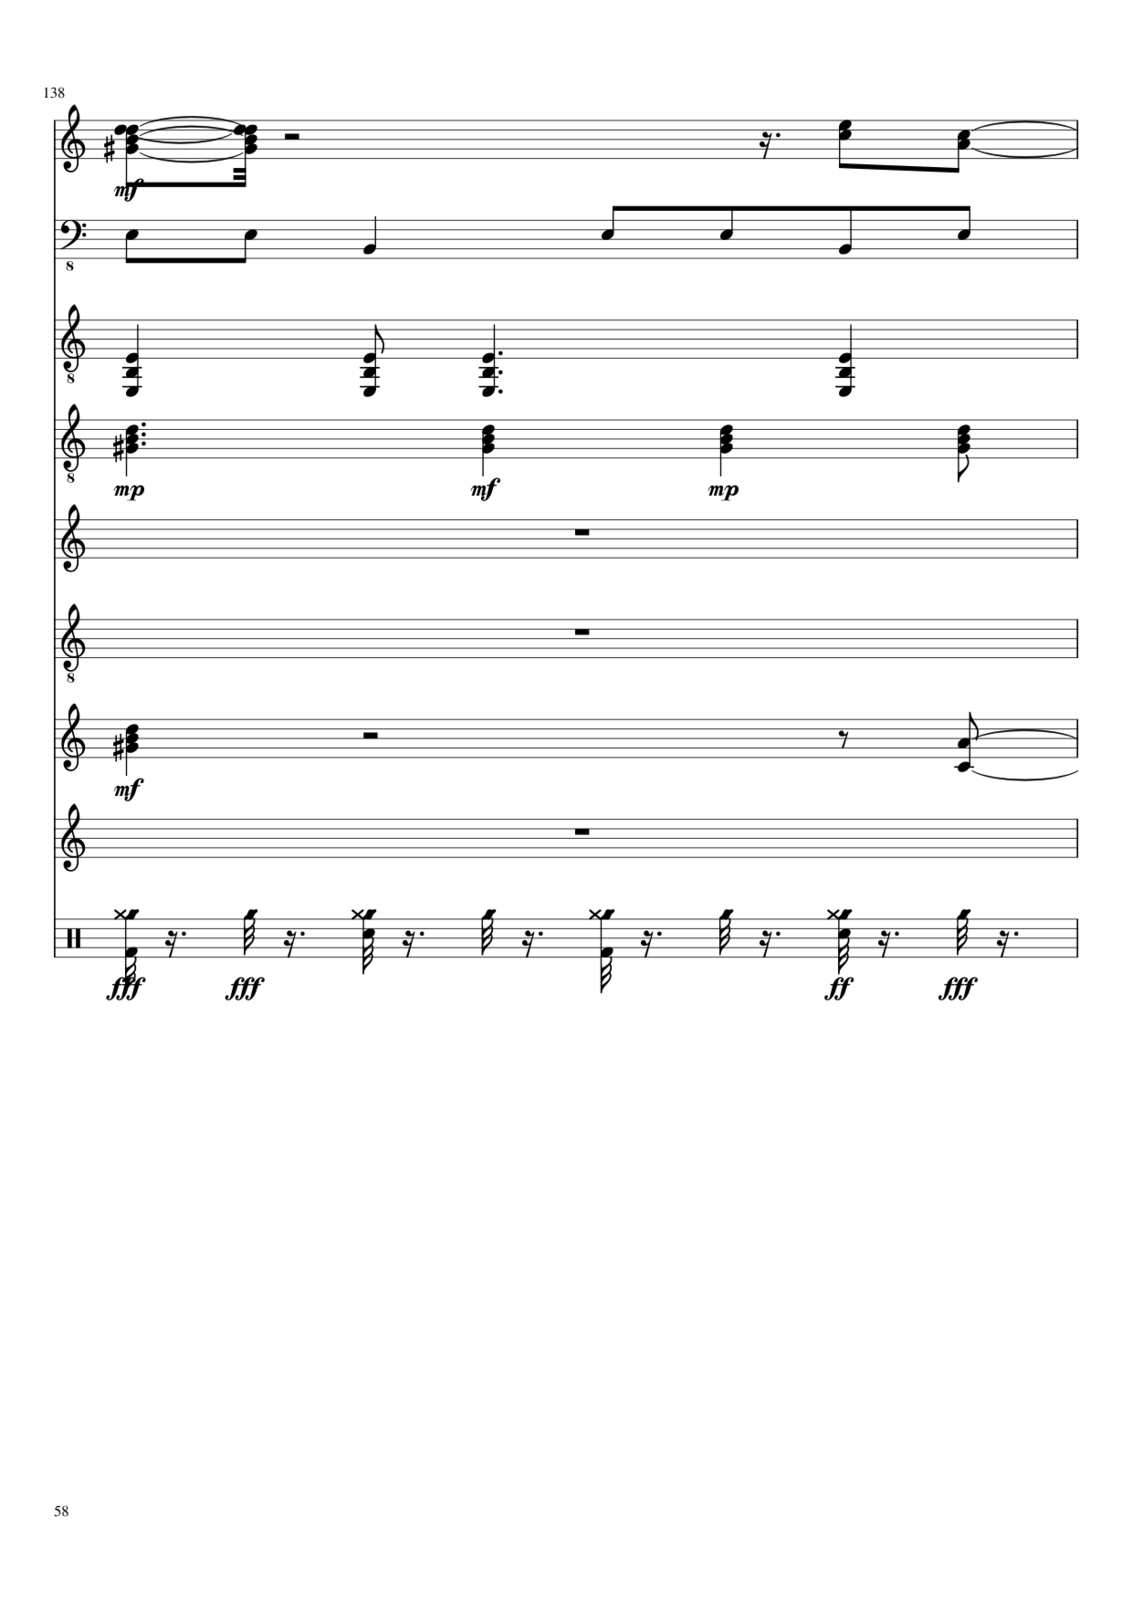 Mrs. Vandebilt slide, Image 58